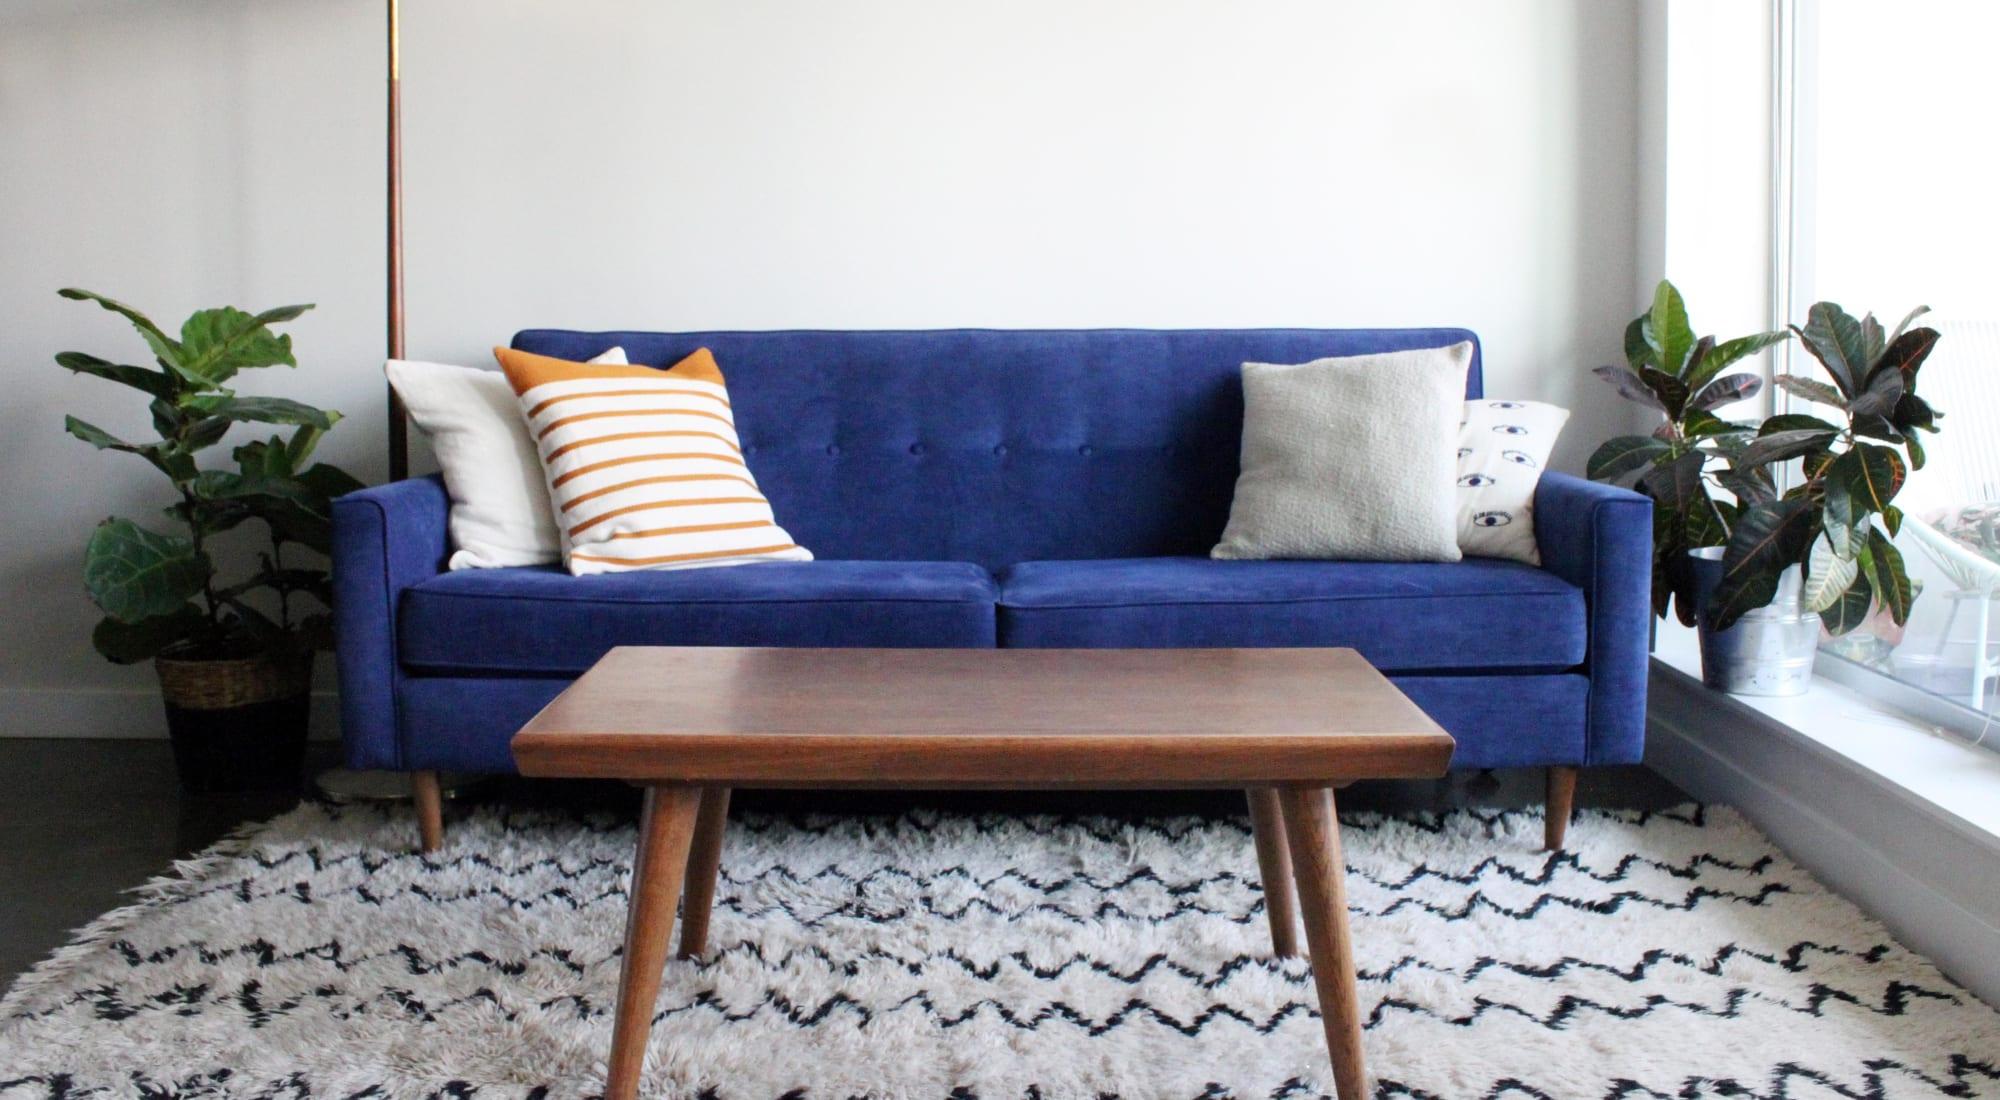 Take a virtual tour of Haven Apartment Homes in Kent, Washington